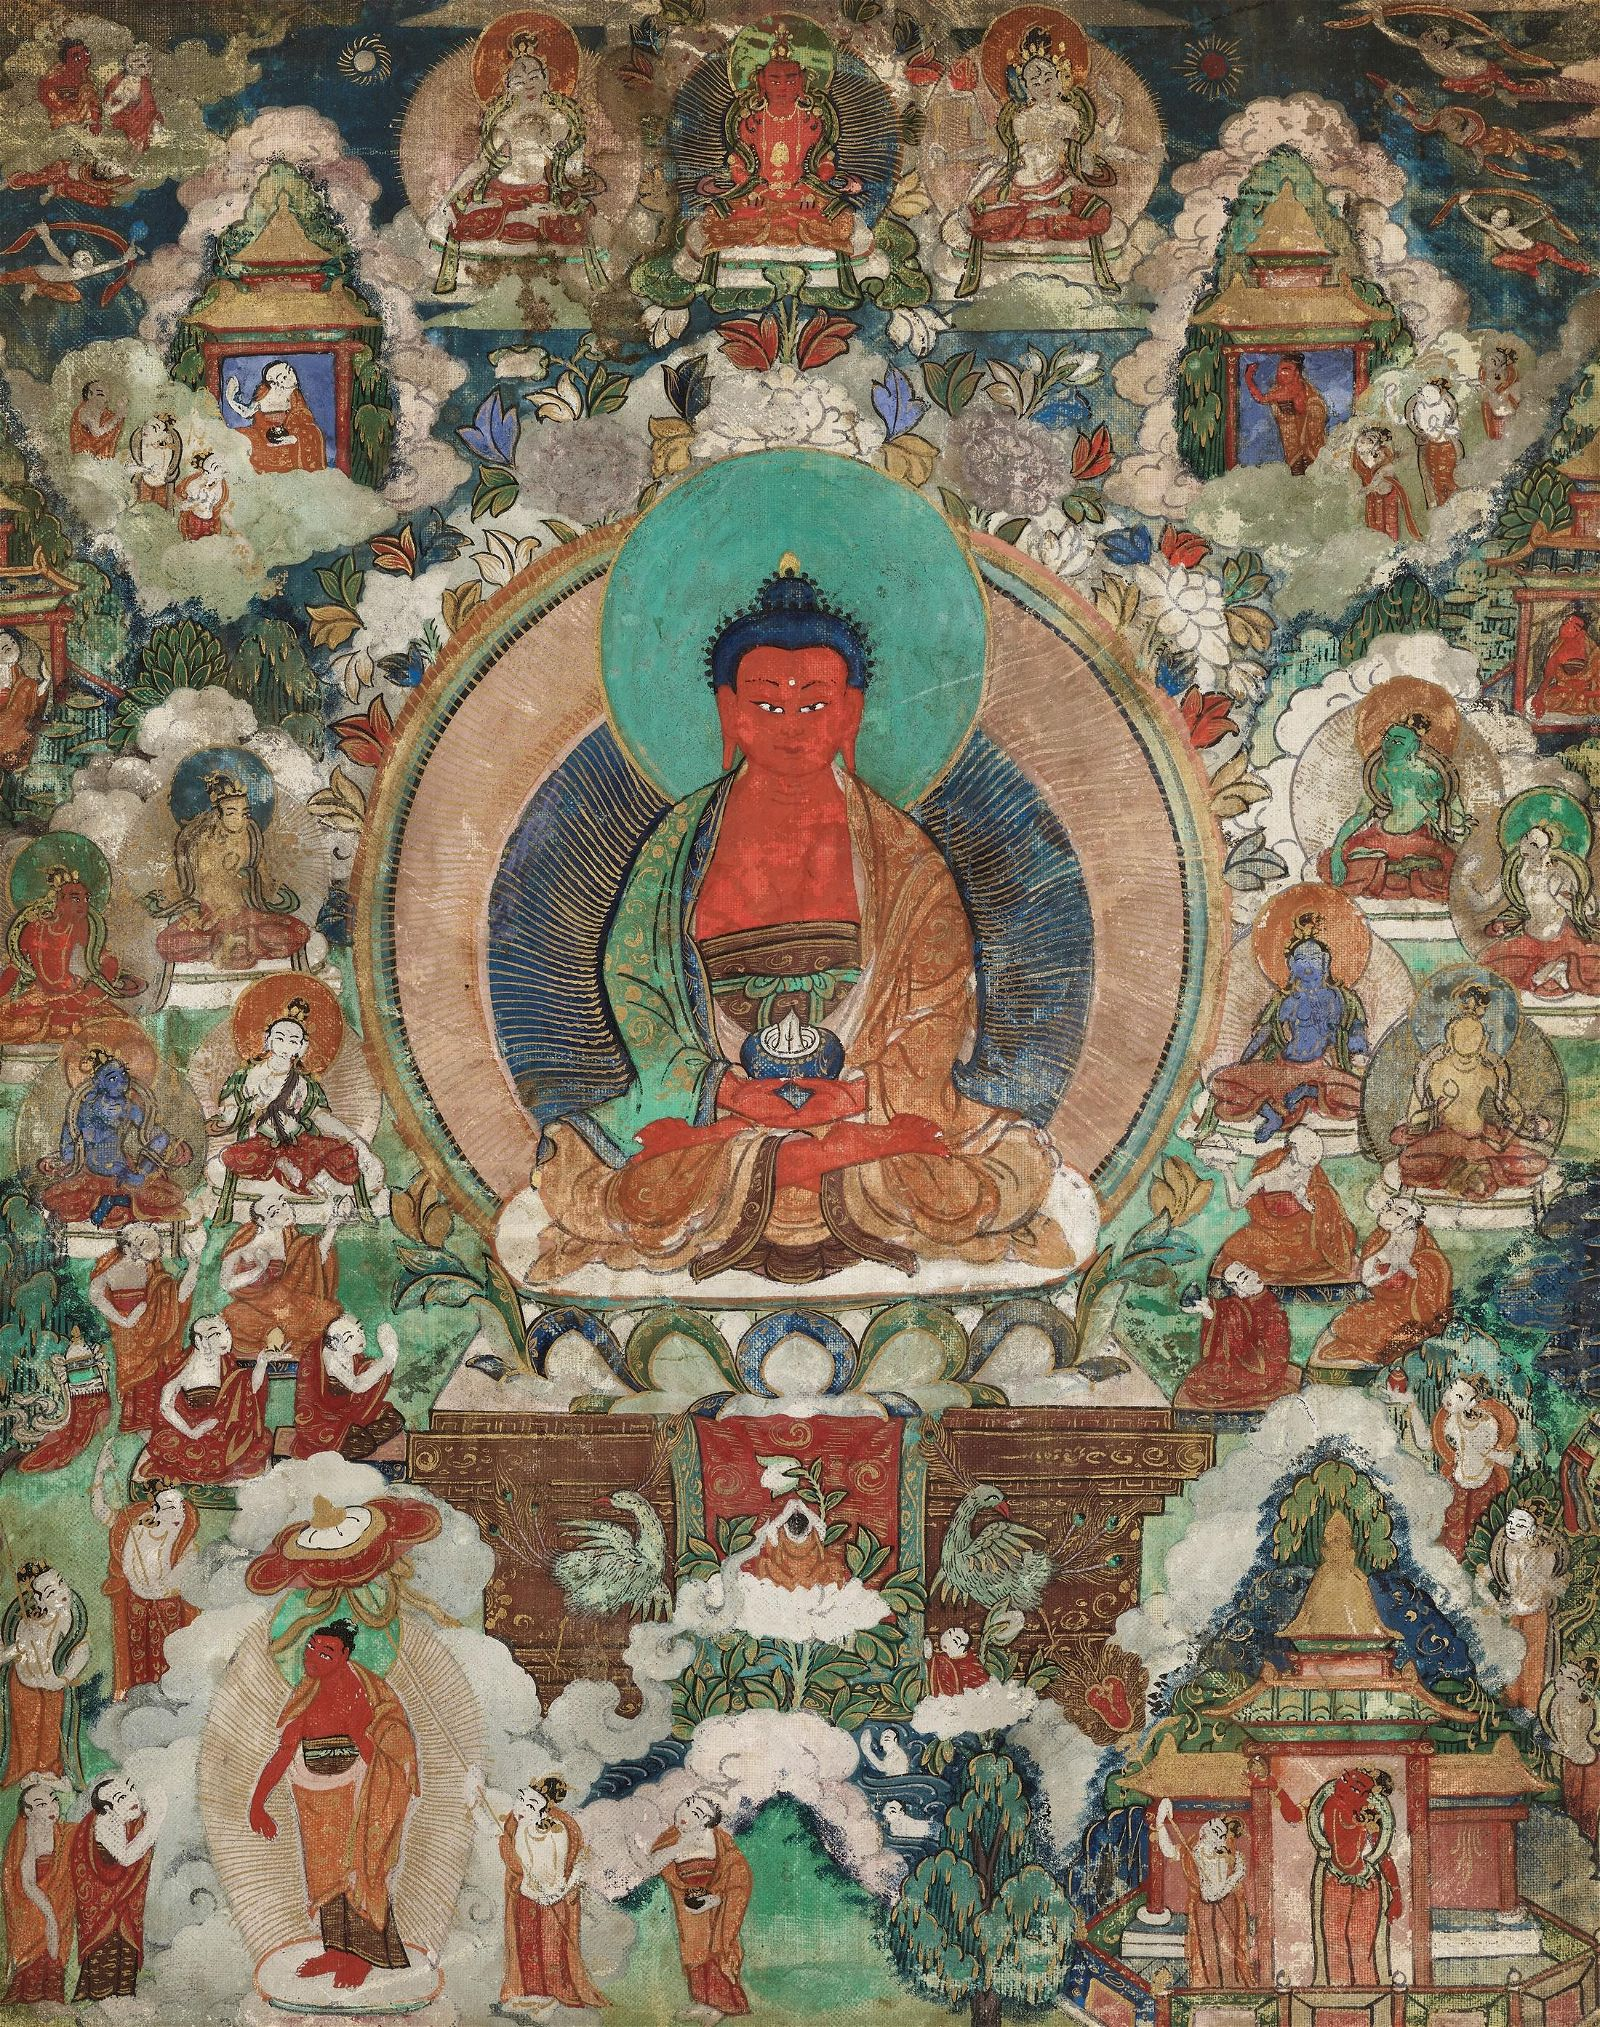 A THANGKA OF THE RED BUDDHA AMITABHA IN SUKHAVATI